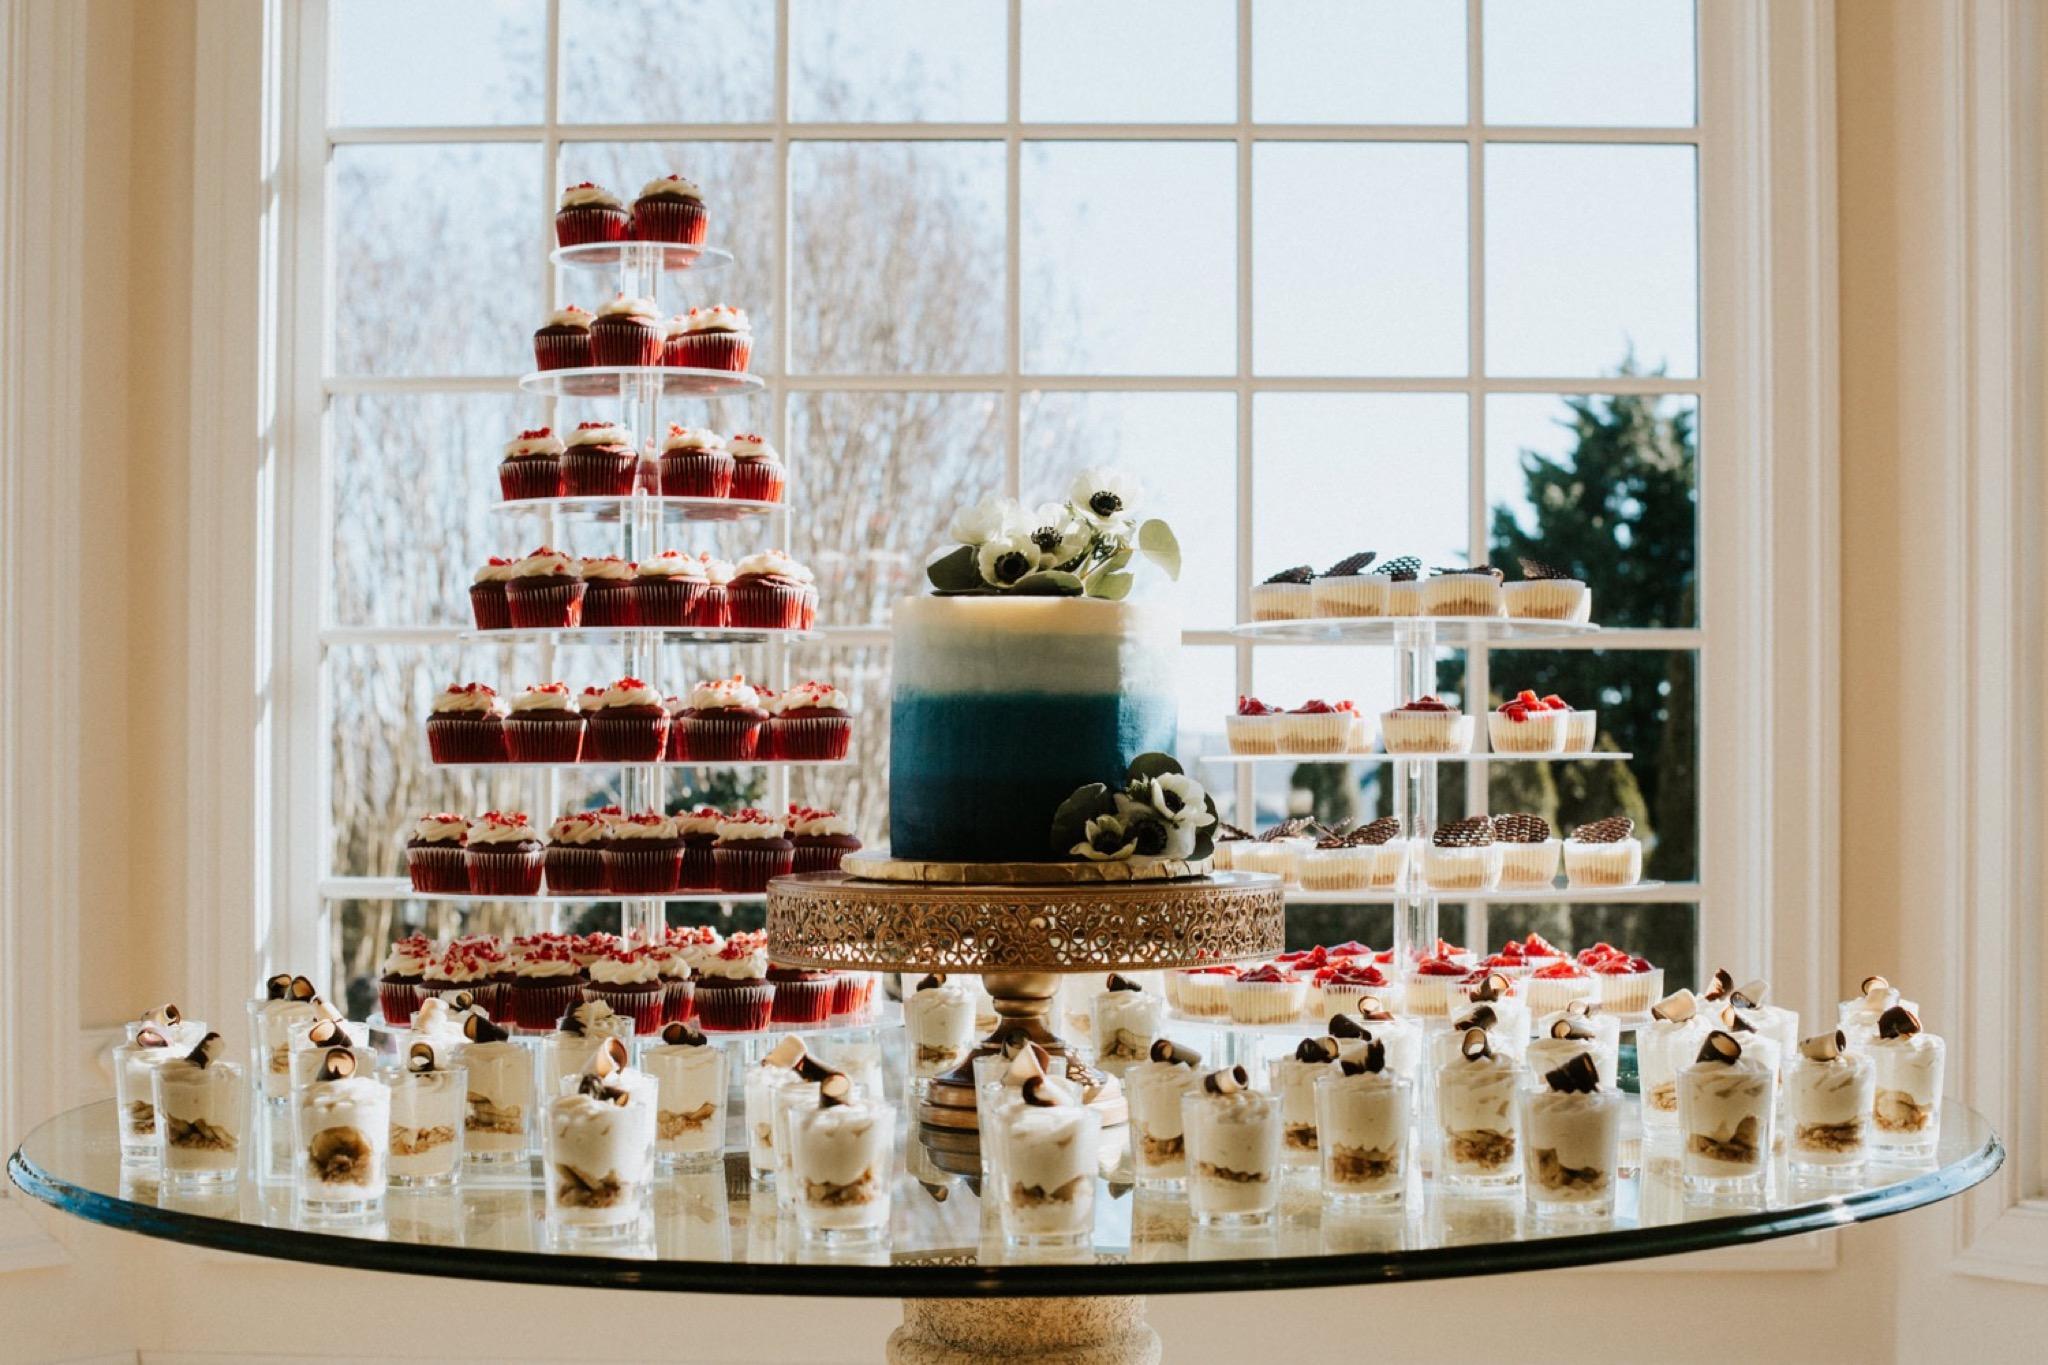 38_West Manor Estate Weddings - Pat Cori Photography-84_details_VirginiaWeddingPhotographer_WestManorEstate_reception_PatCoriPhotography.jpg